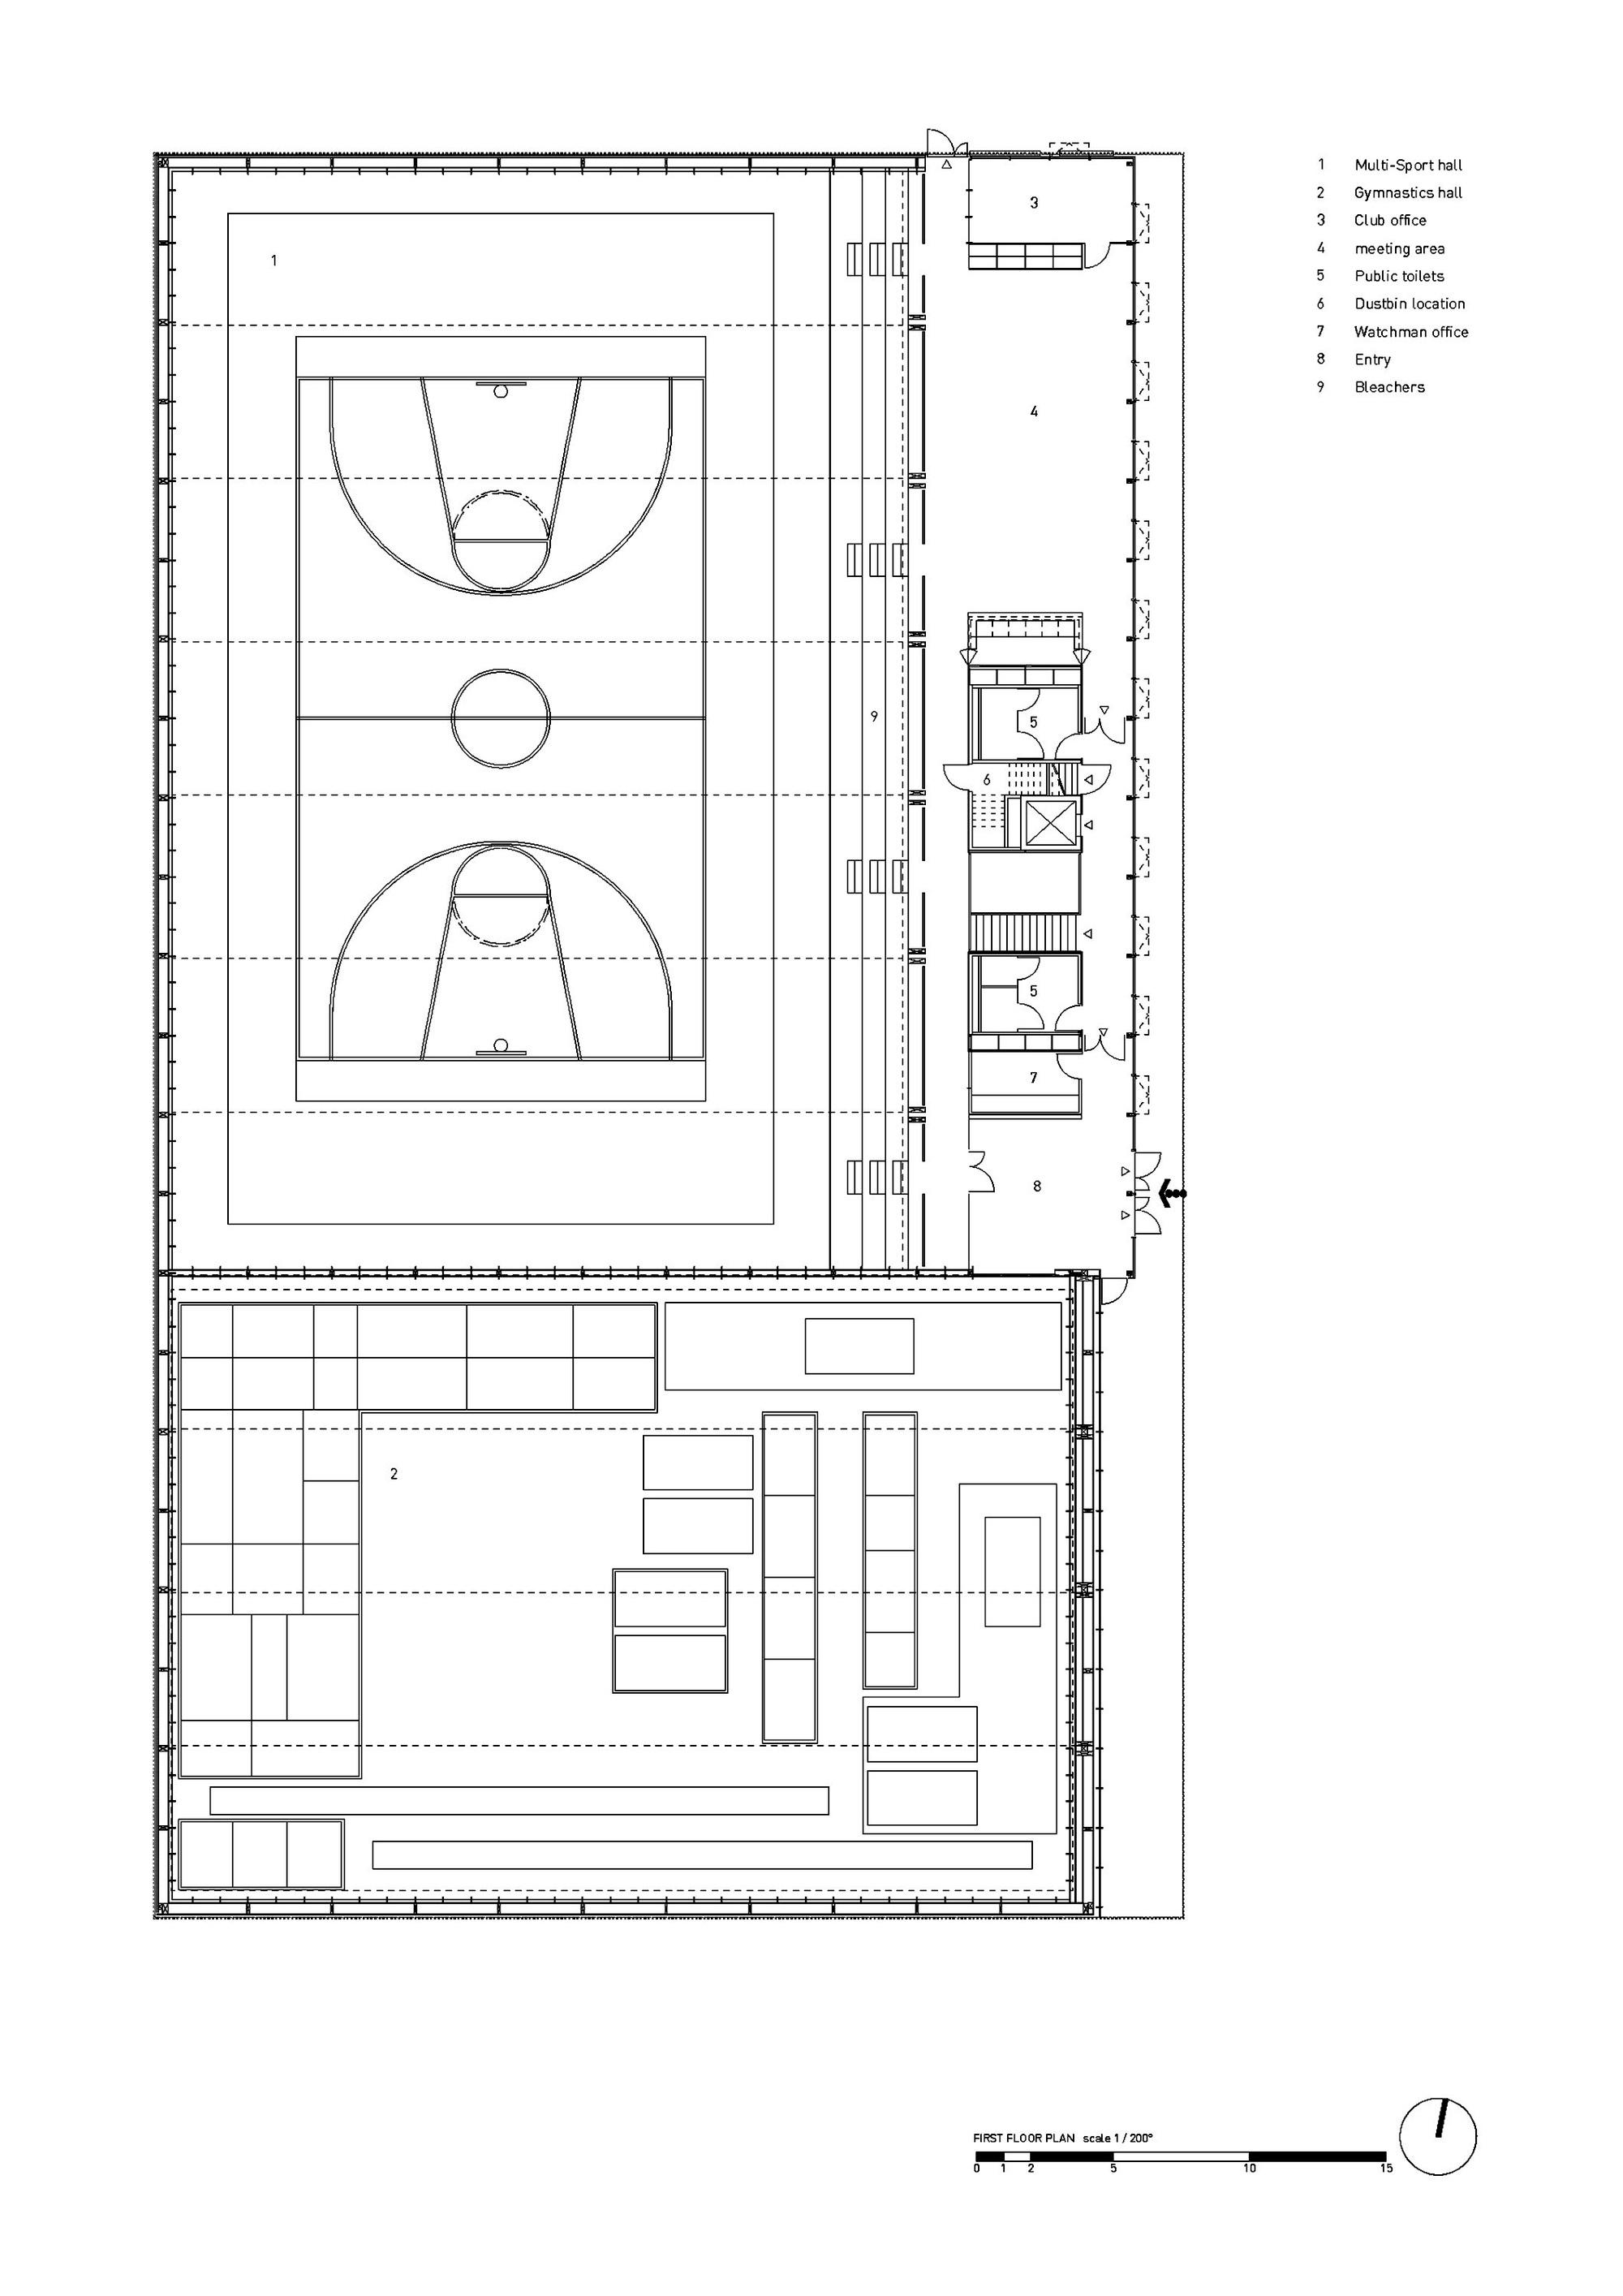 Gallery of hacine cherifi gymnasium tectoniques for Gym floor plans